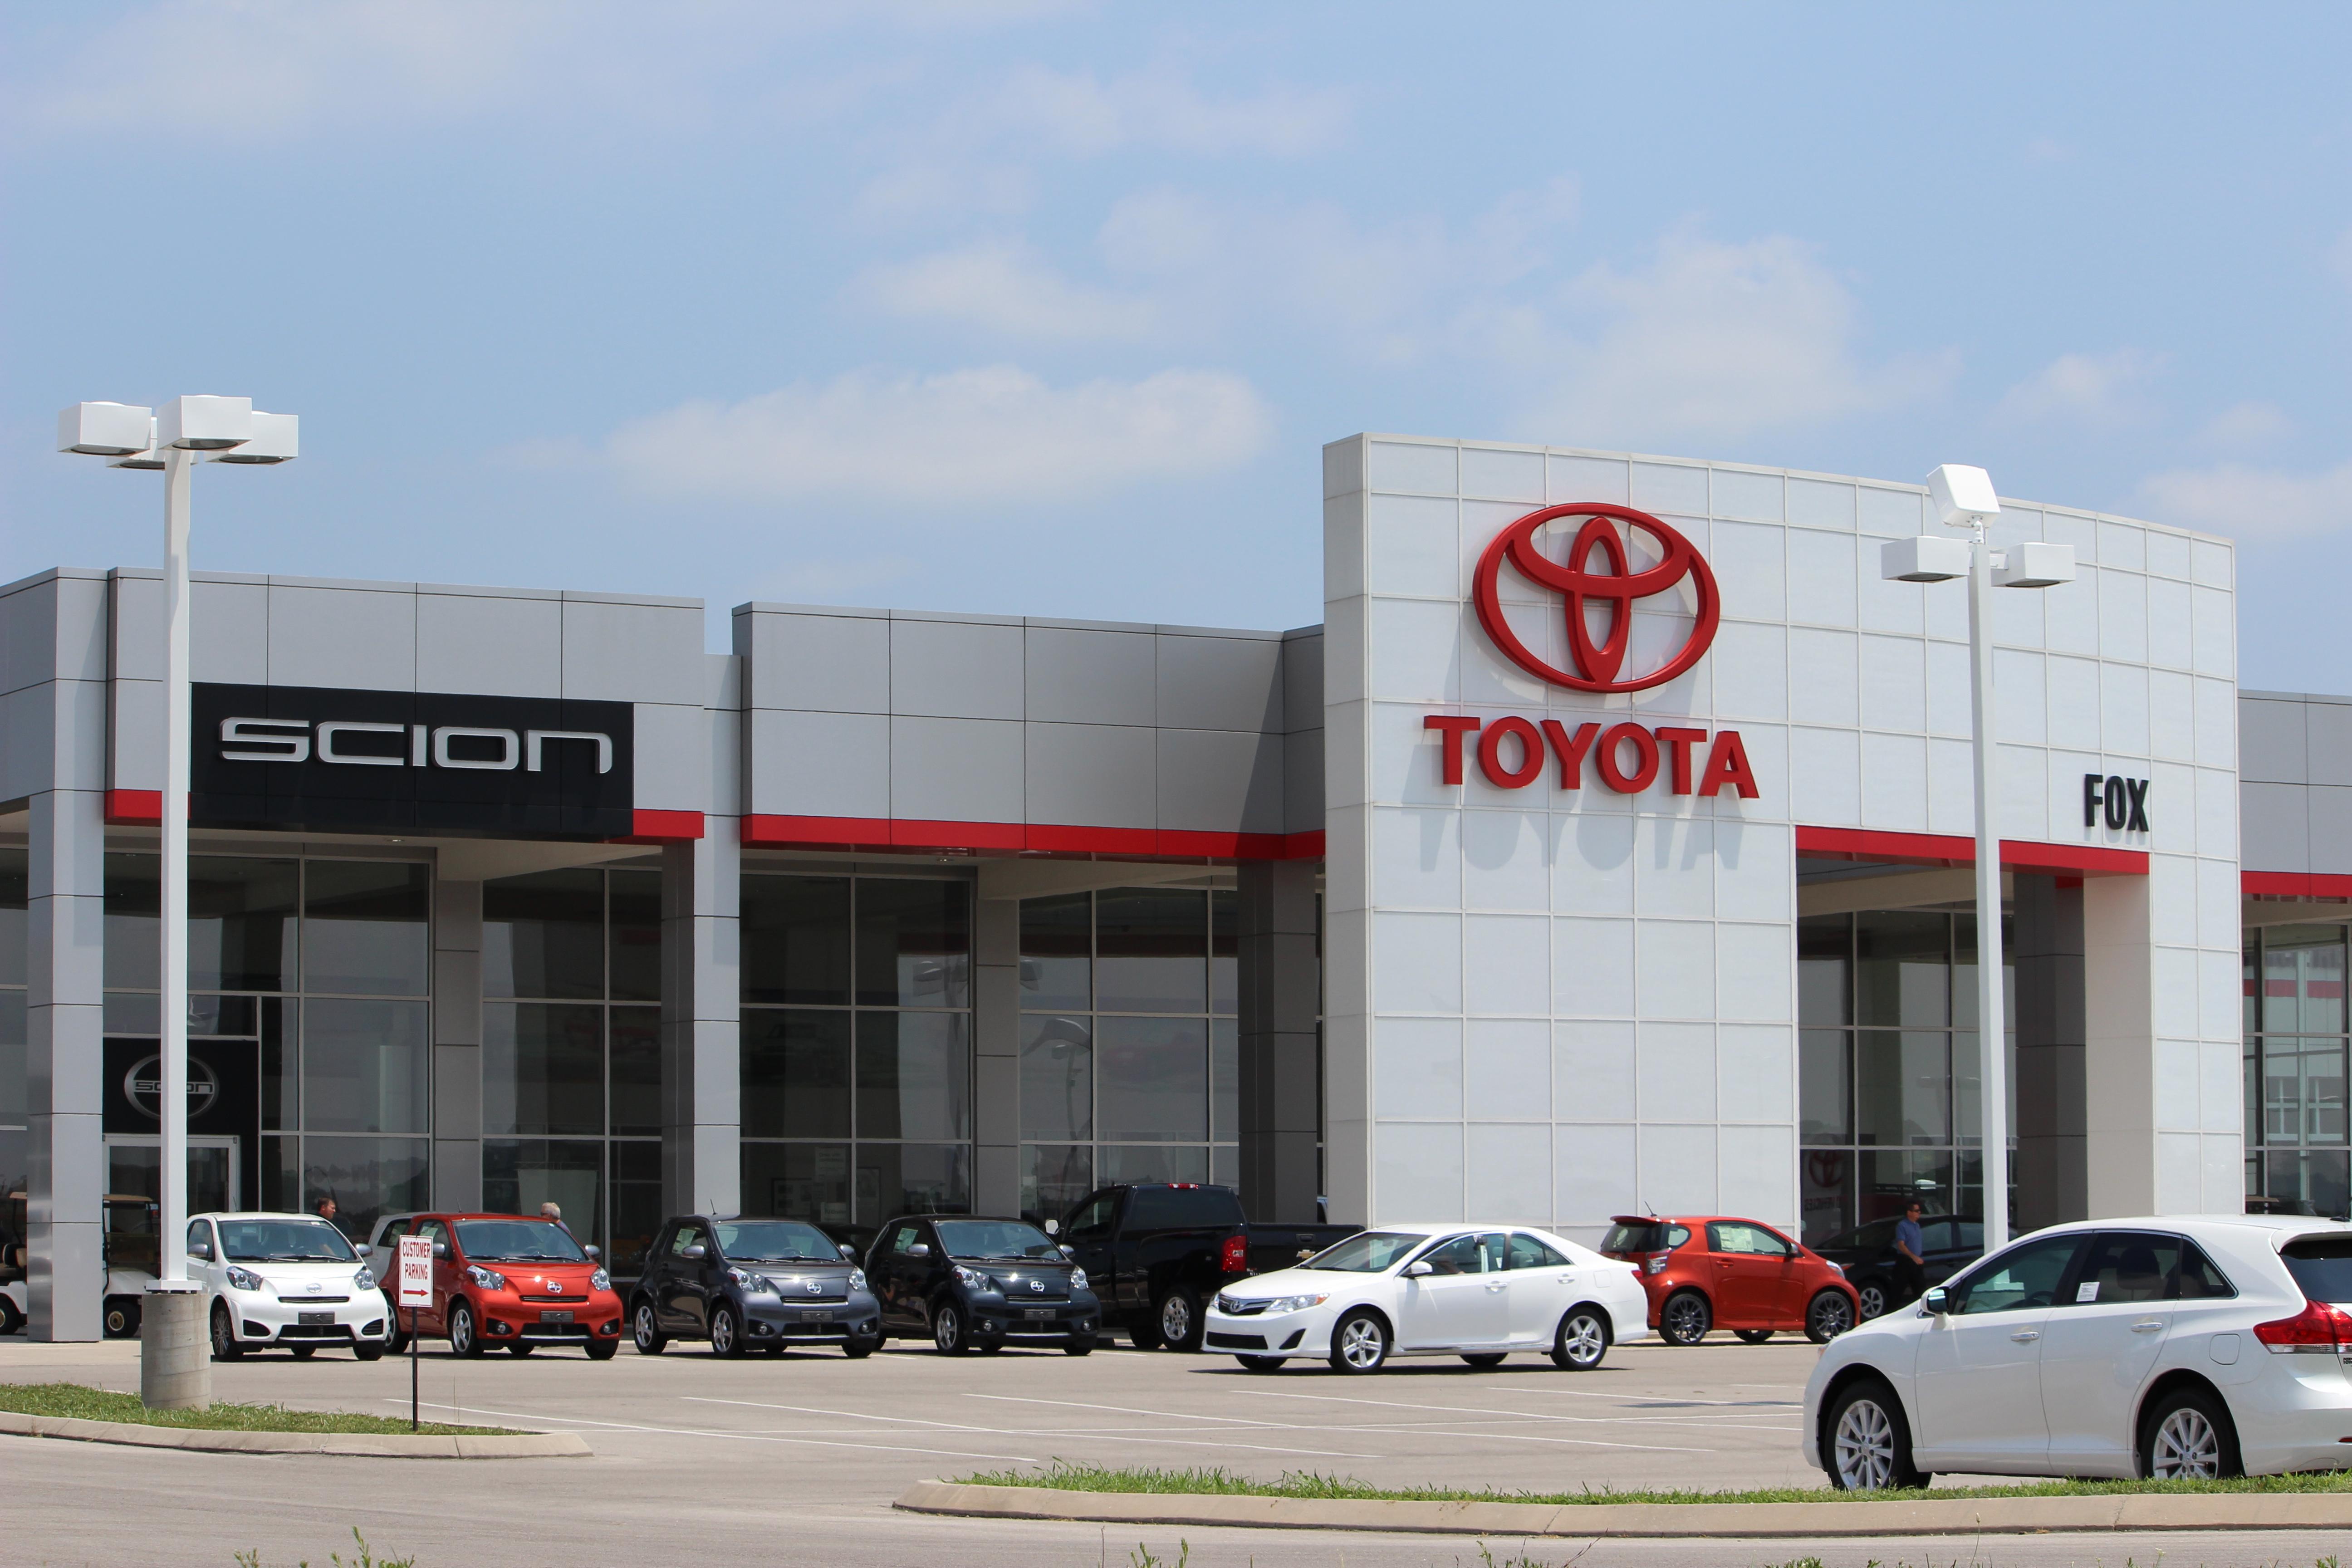 Fox Toyota image 3